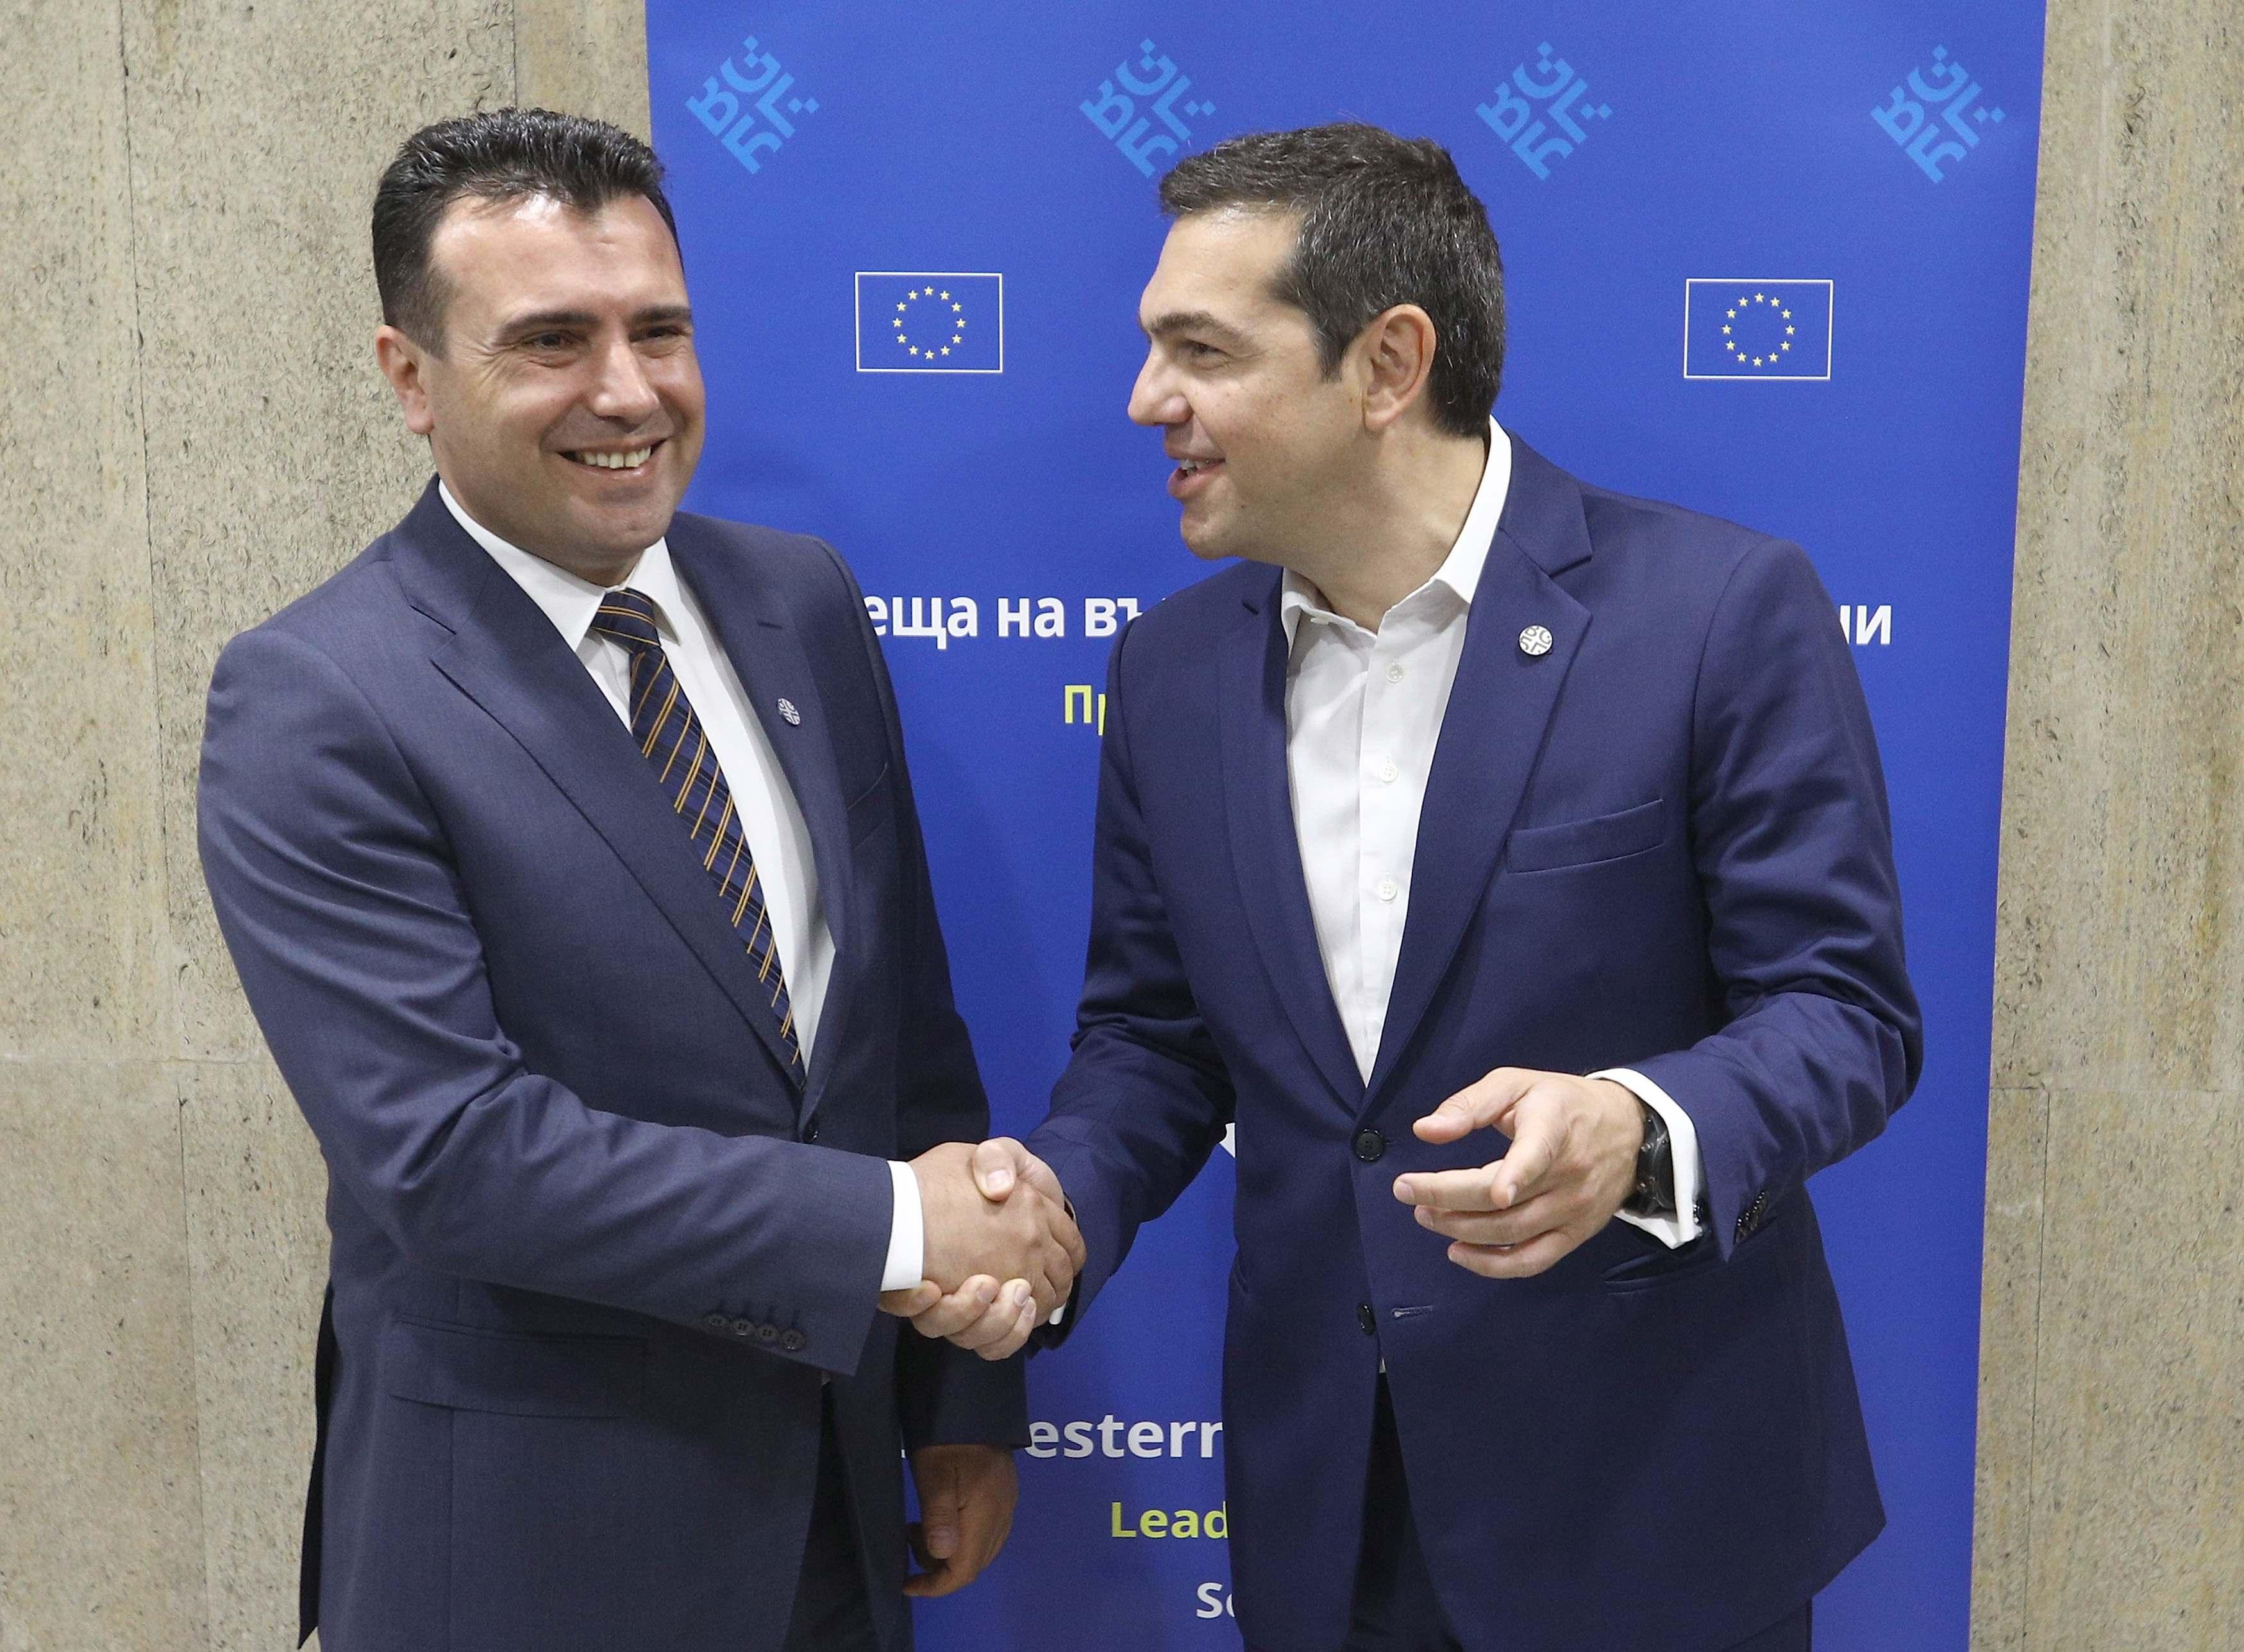 kare-kare-i-synantisi-tsipra-zaef-fotografies1